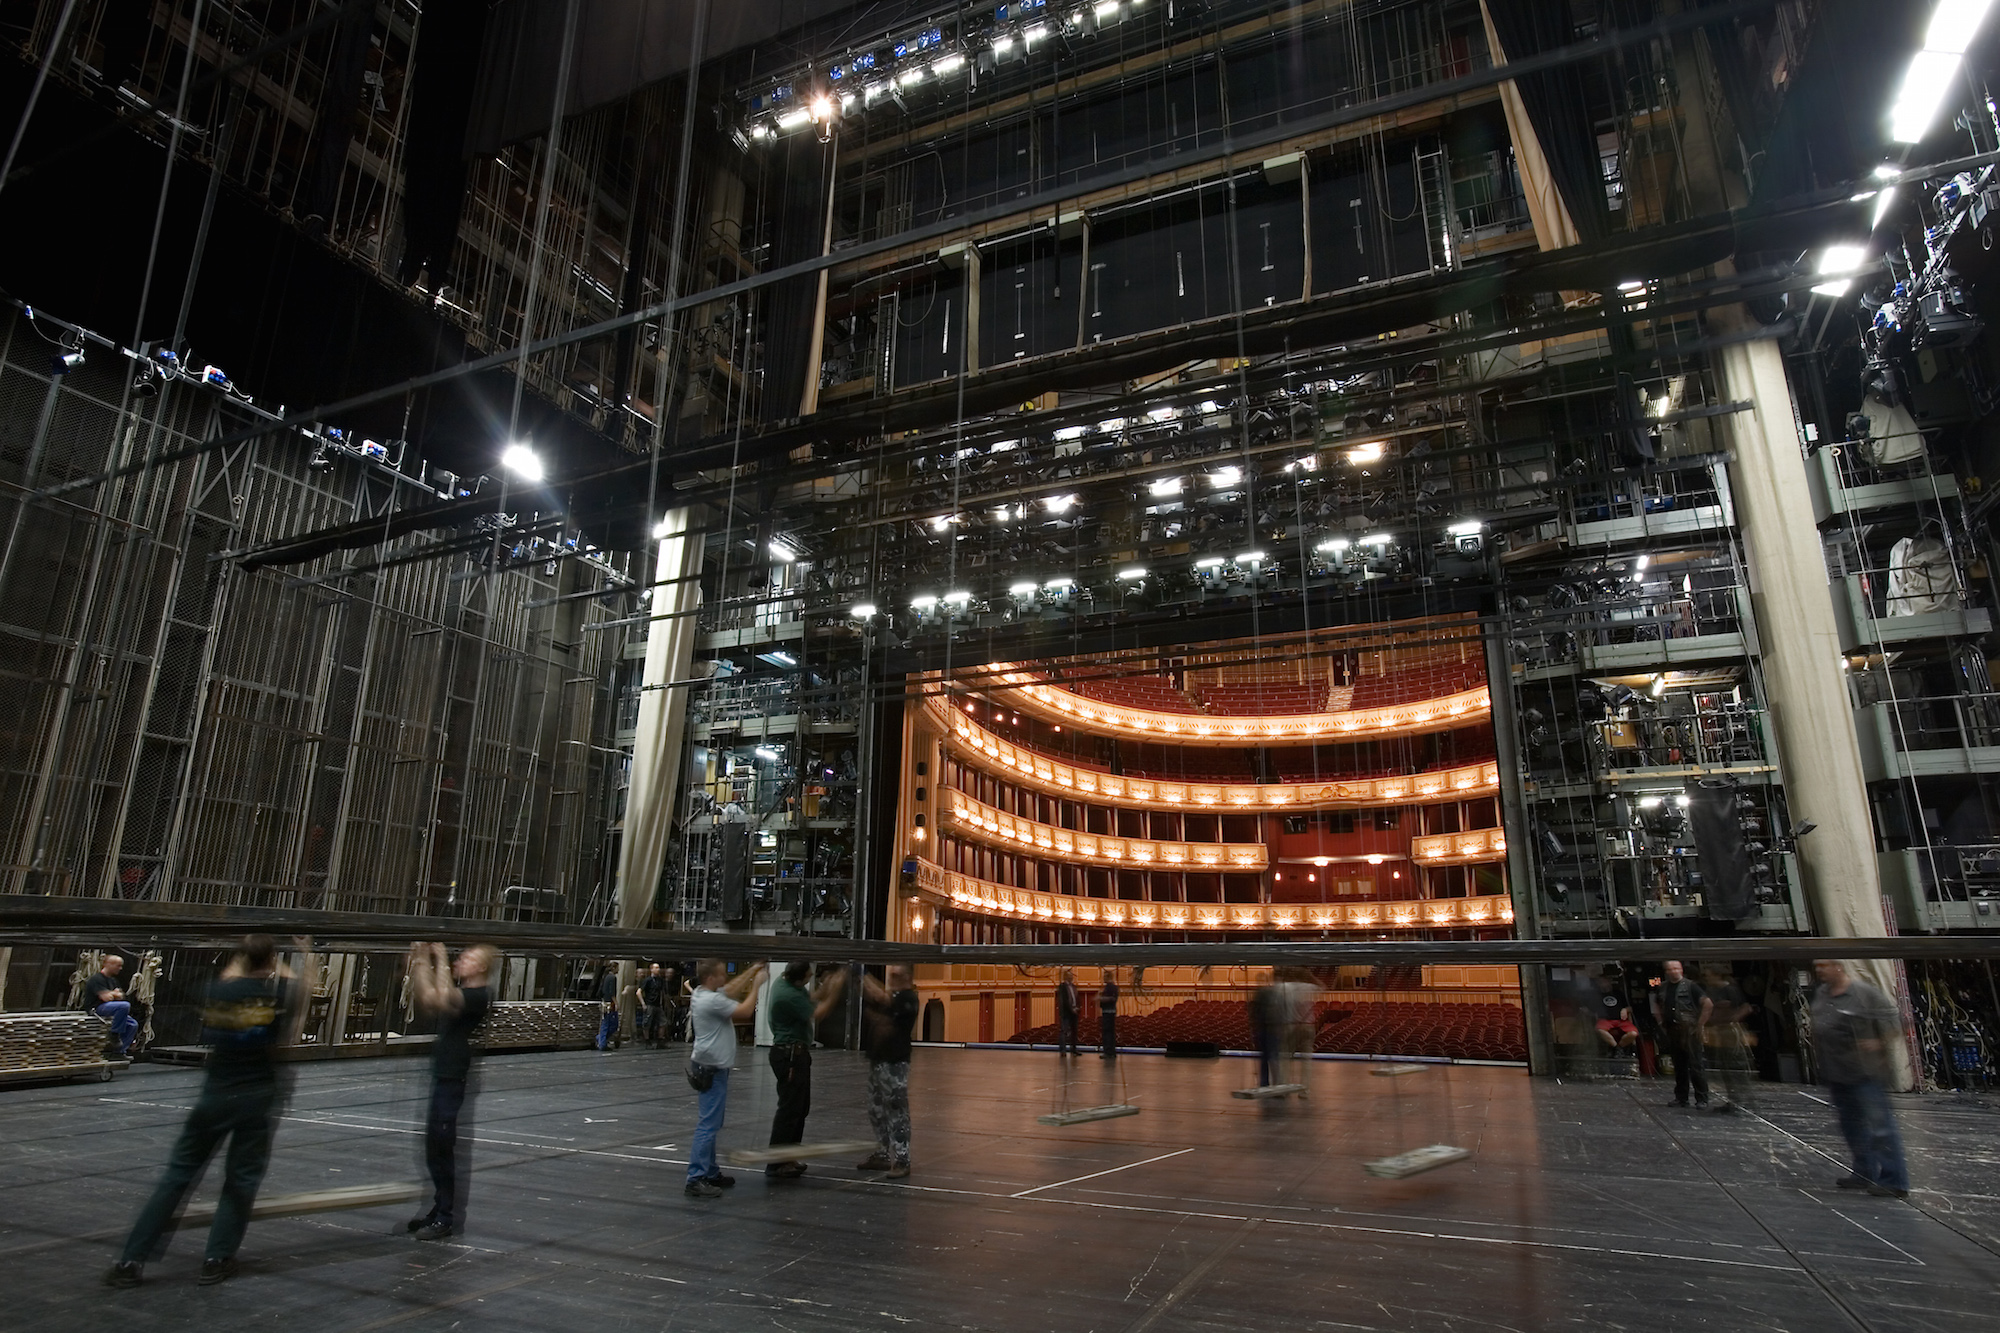 Vienna Opera Backstage, Austria